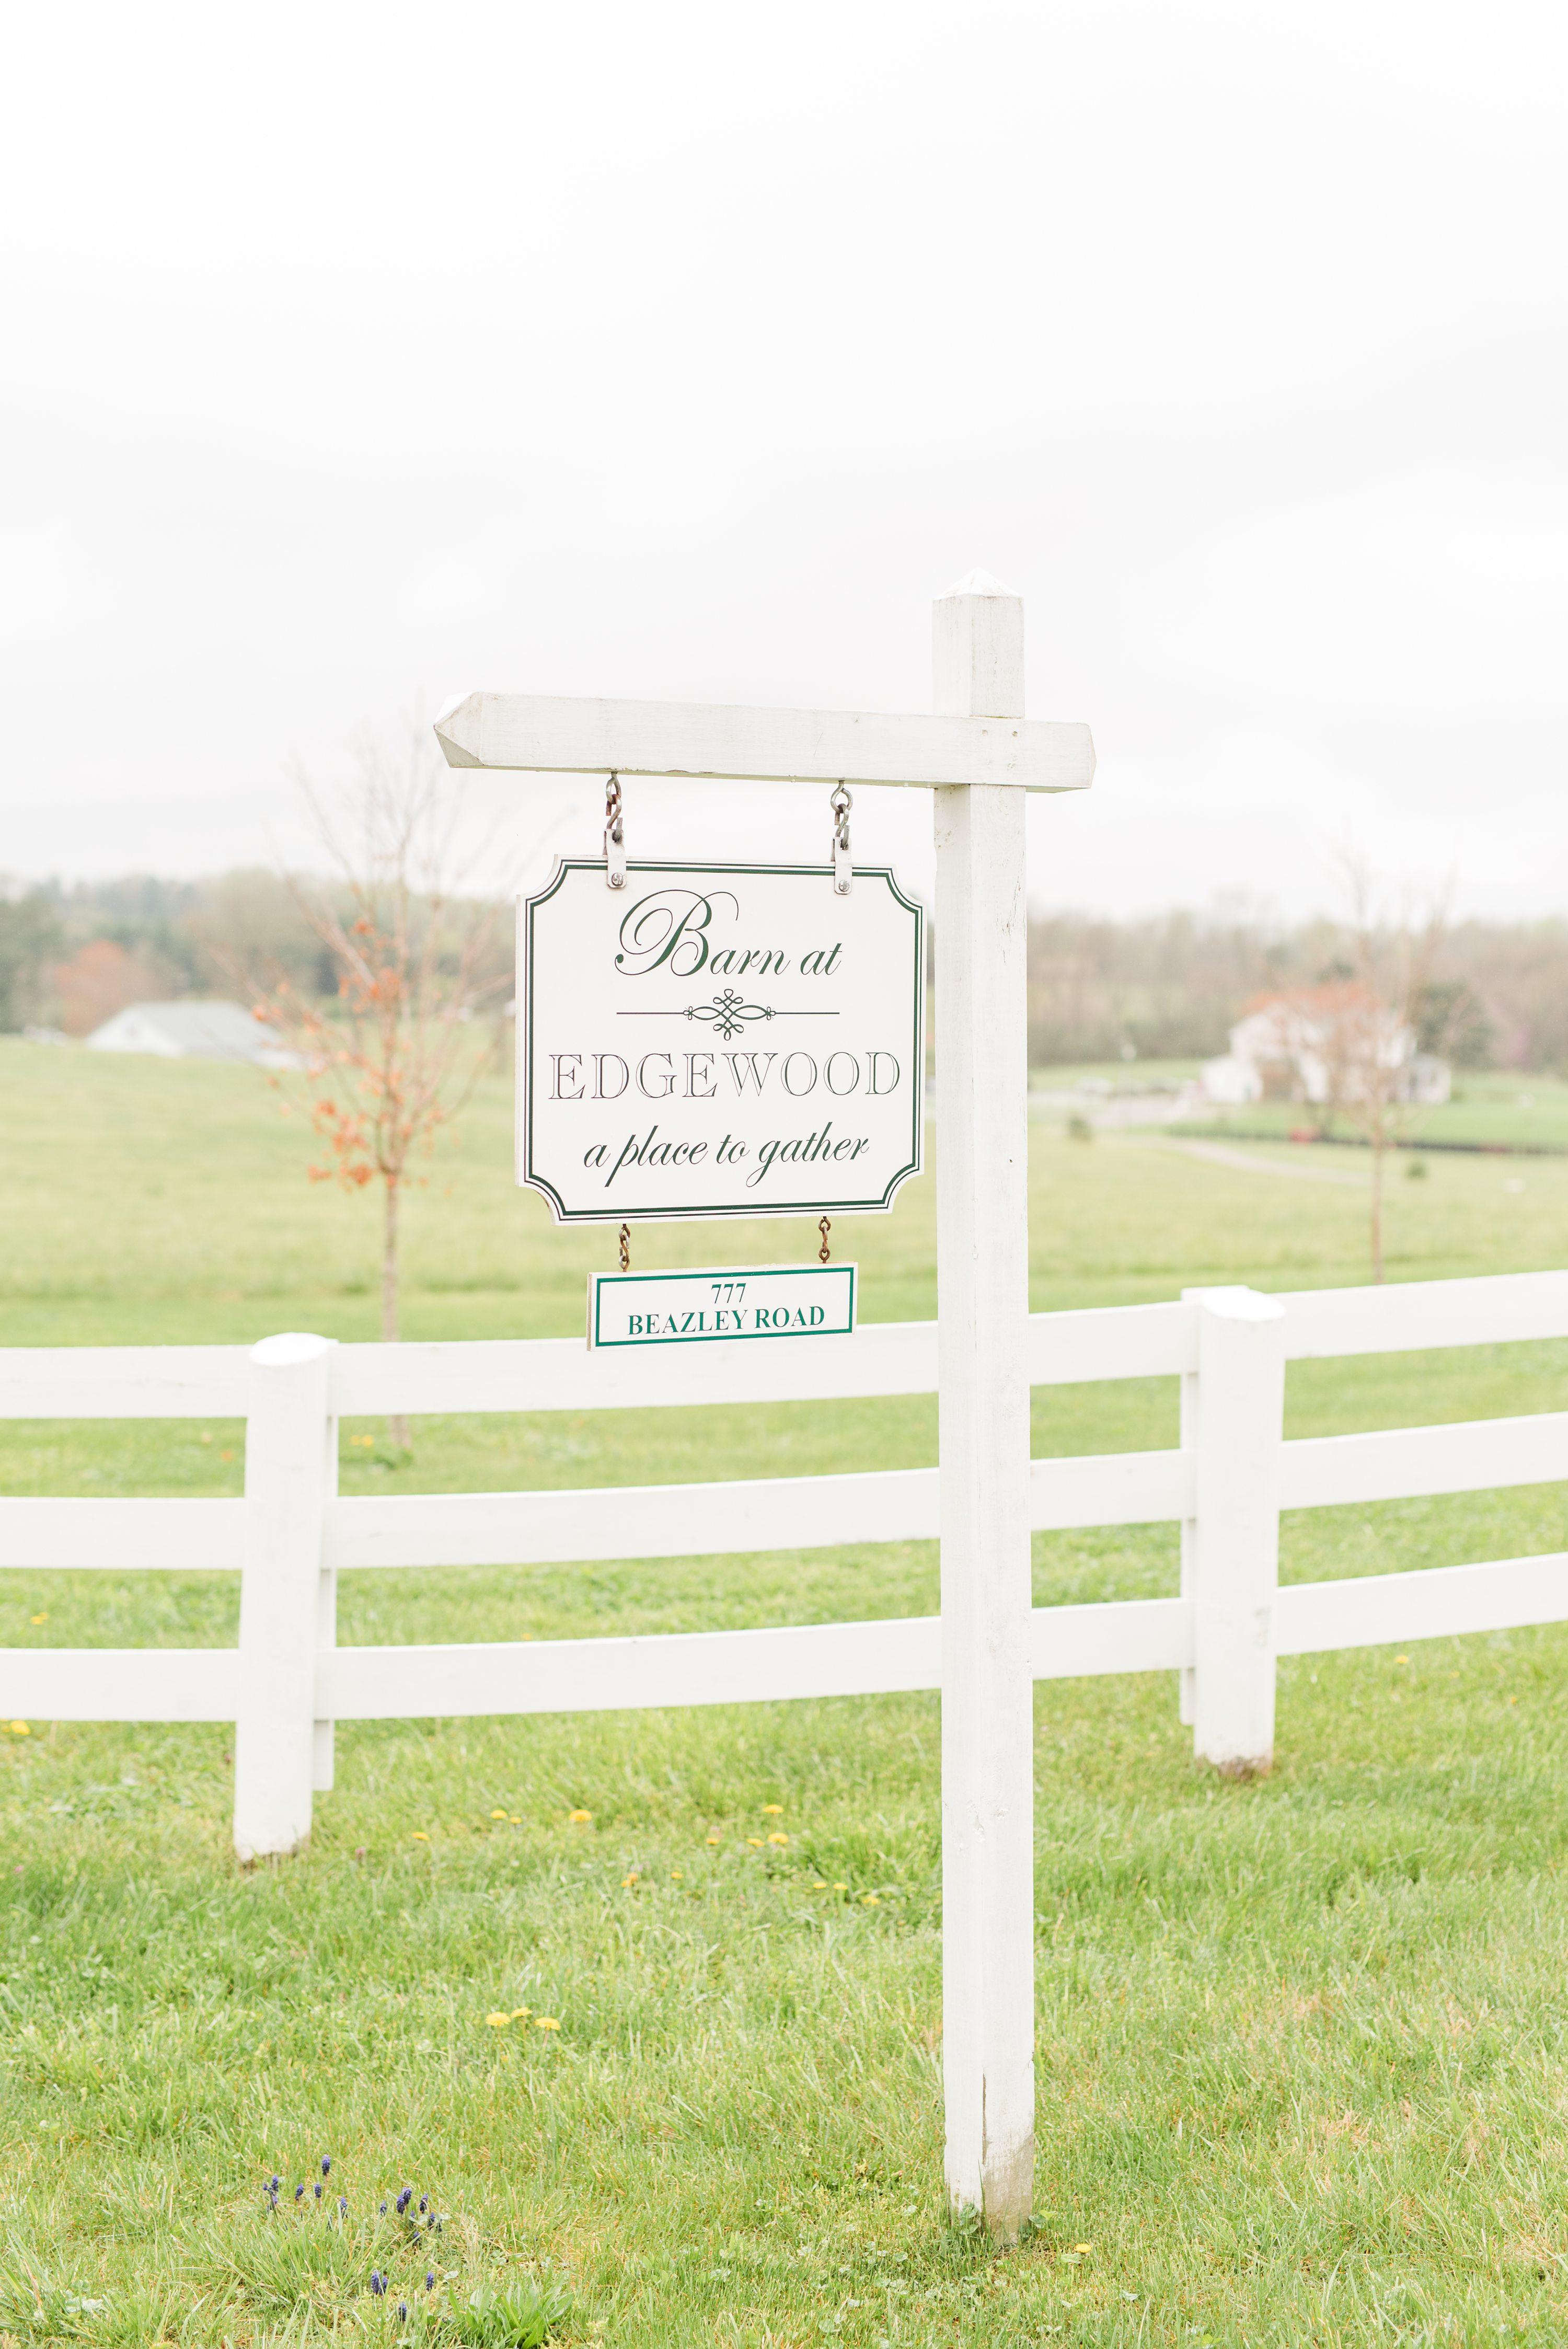 Spring,Barn,Barn at Edgewood,charlottesville wedding